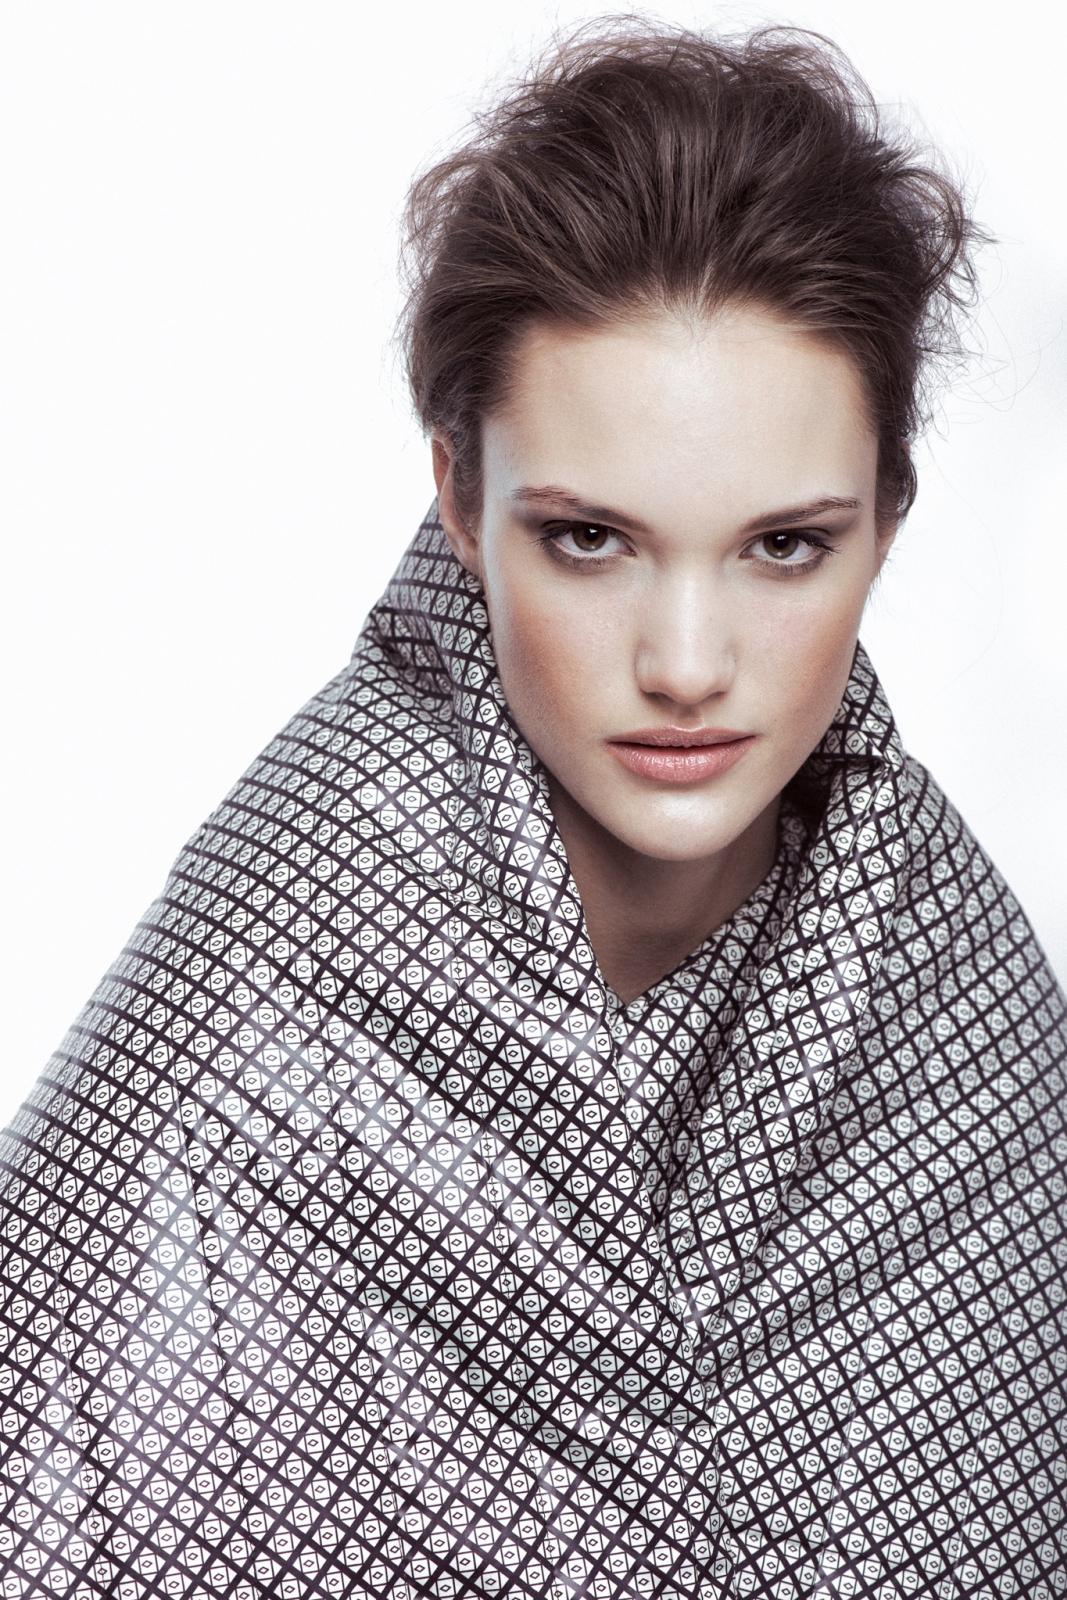 Model: Kinga Trojan / D'vision | Stylist: Ewa Michalik | MUA: Vika May | Hair: Patryk Nadolny